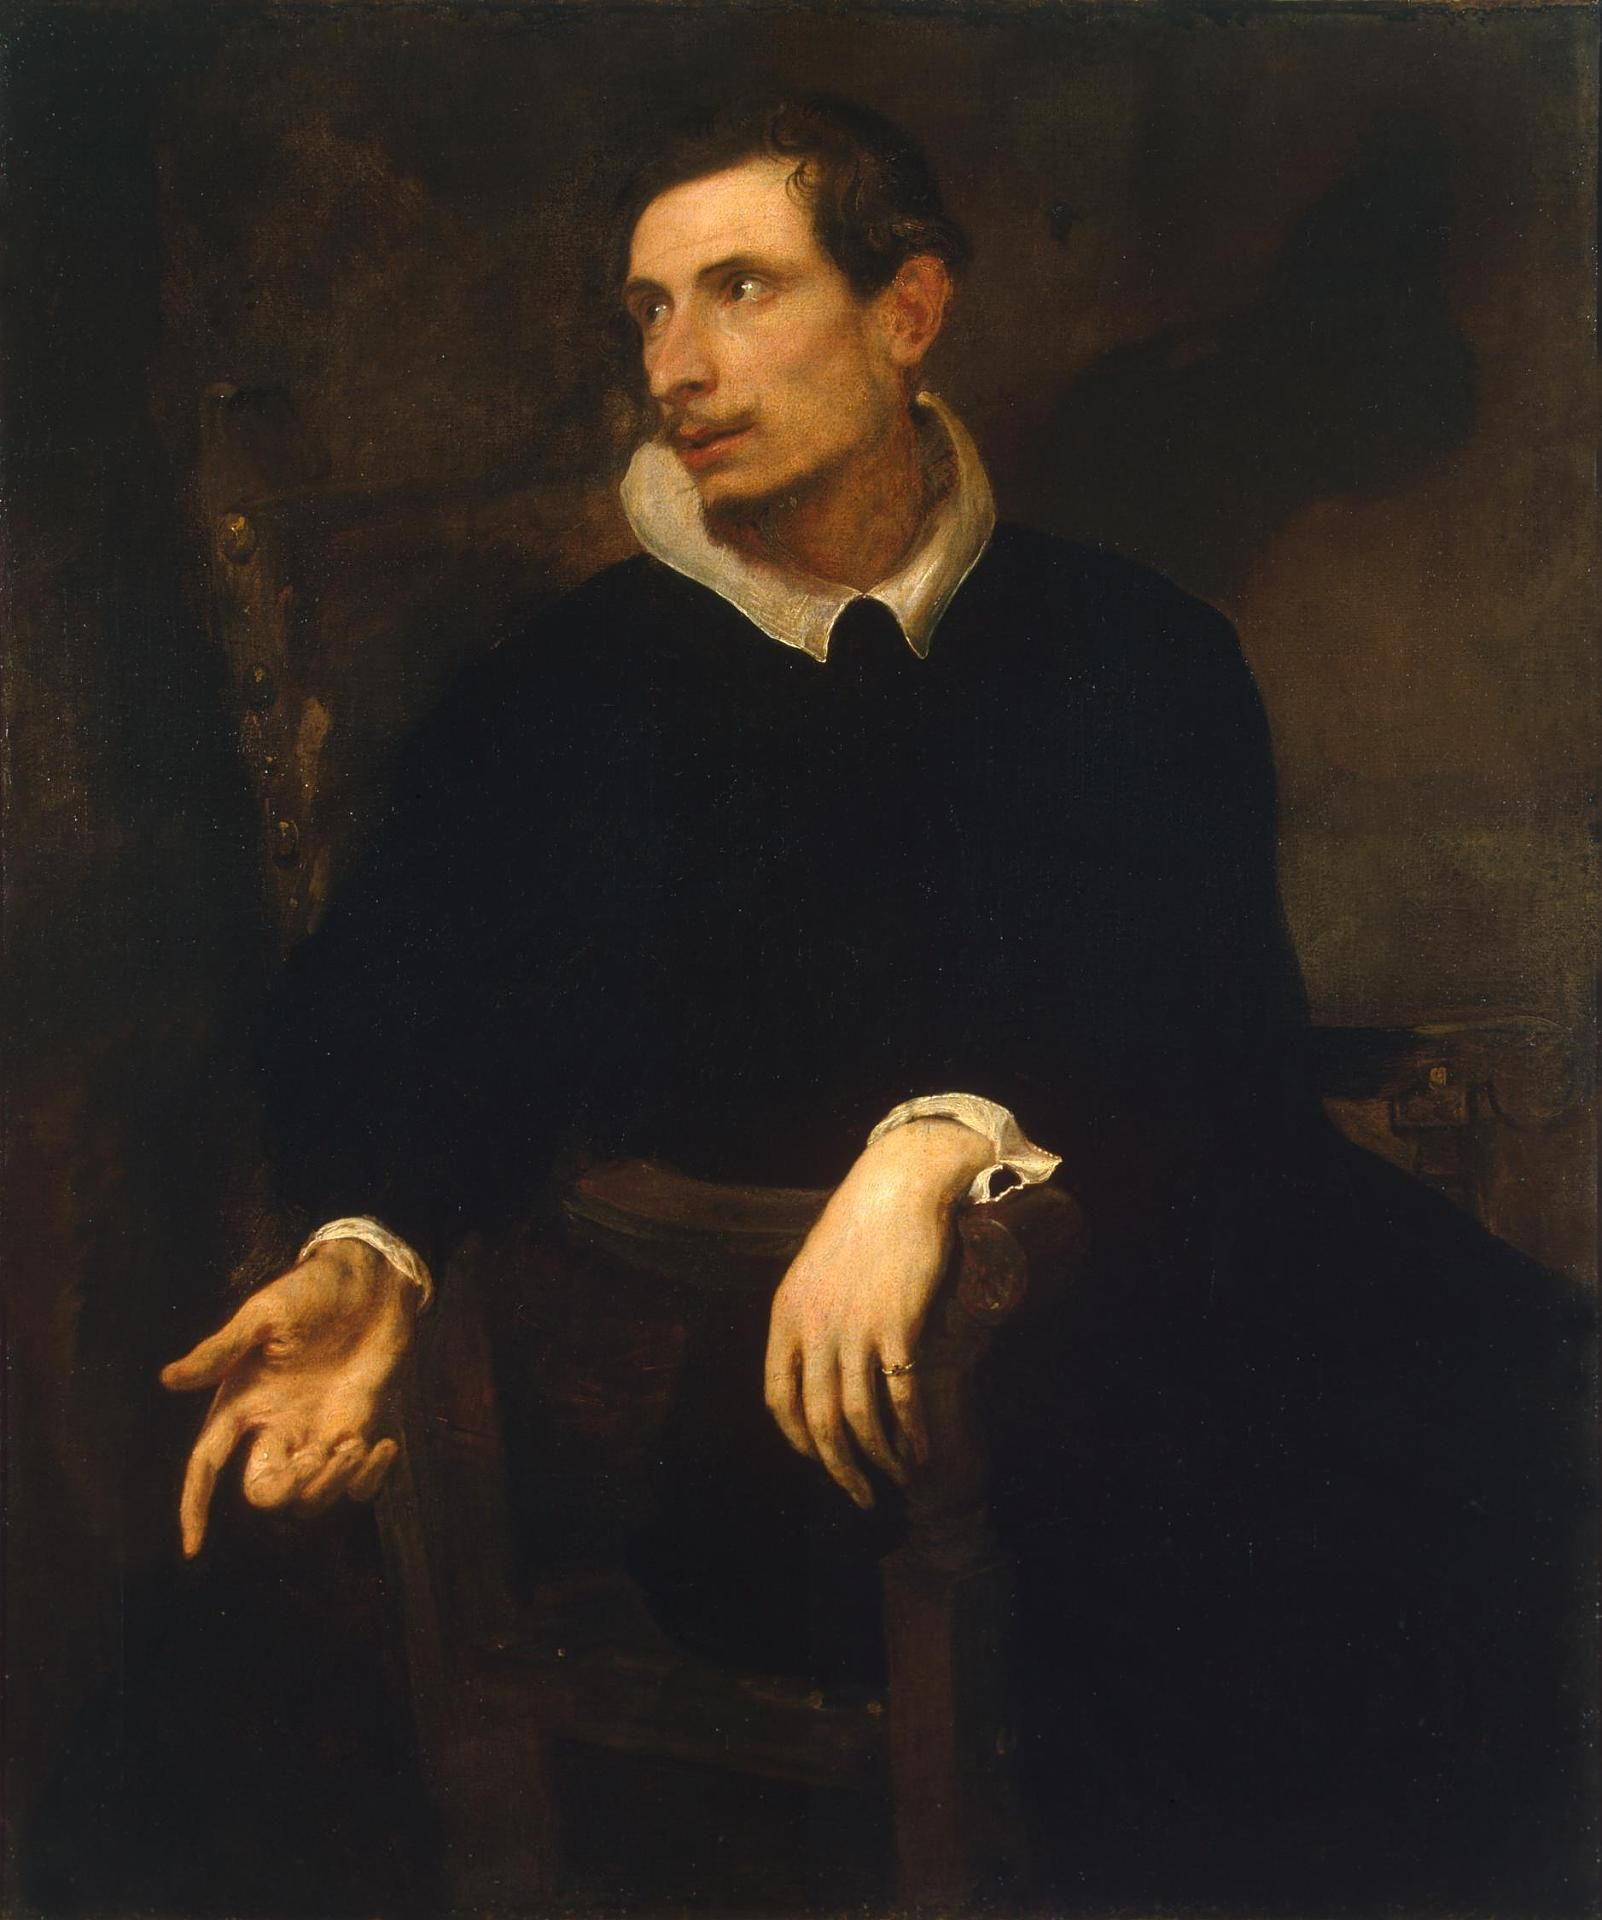 Anthony van Dyck - Portrait of Virginio Cesarini